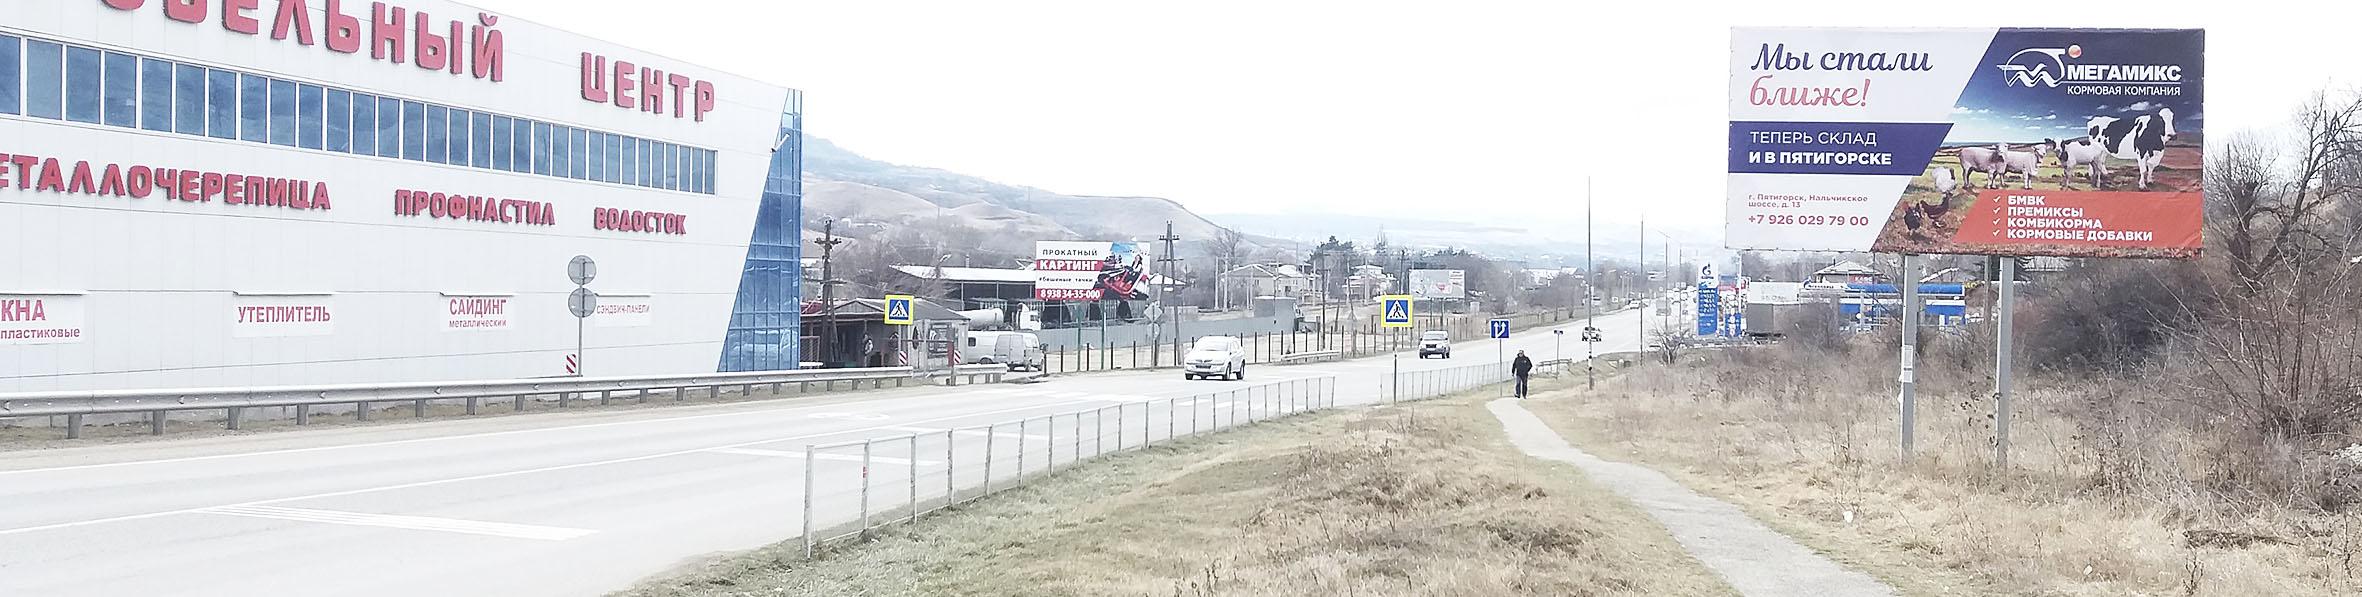 Реклама на билбордах на Кавказе щиты 3х6